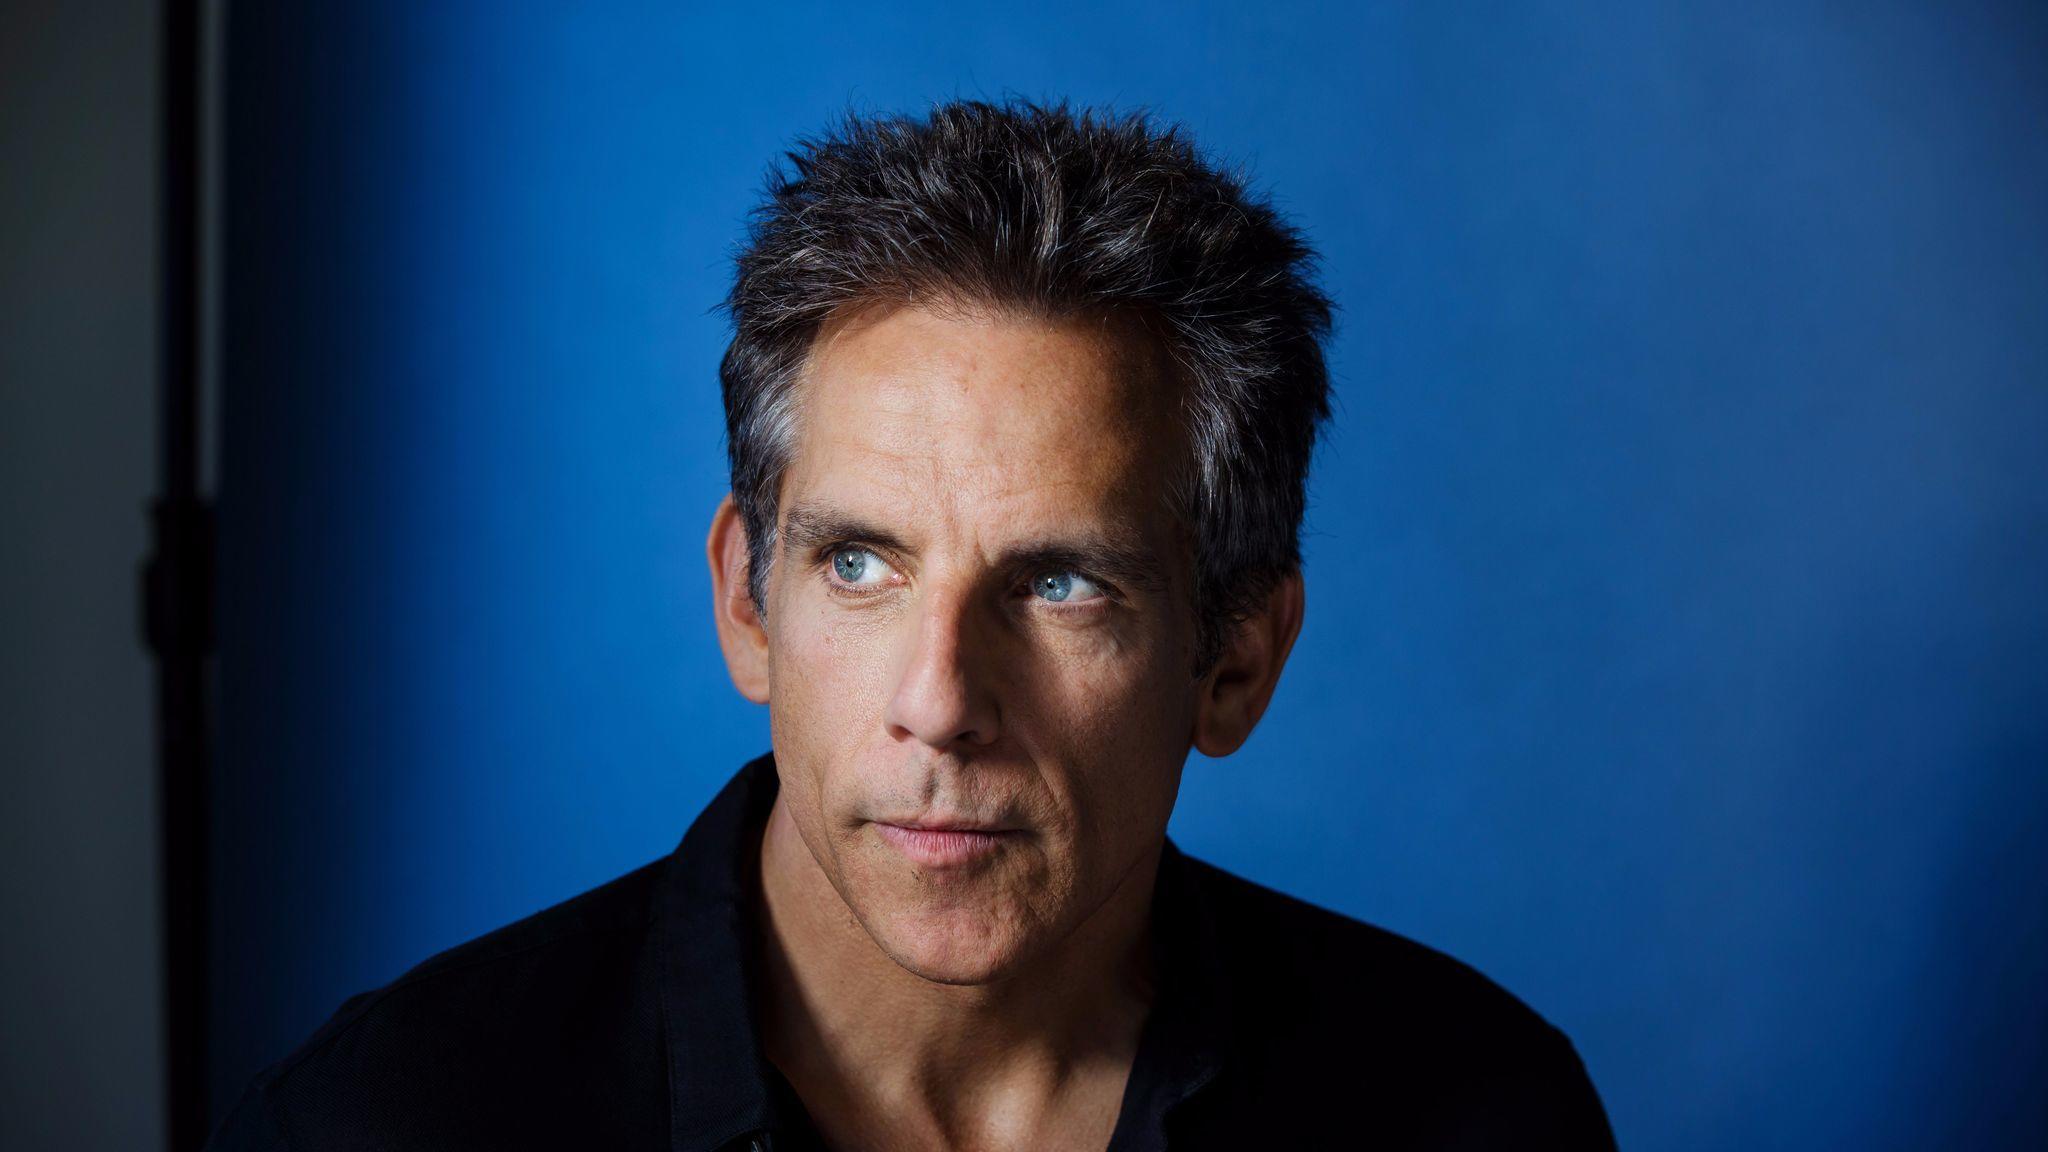 Ben Stiller (Marcus Yam / Los Angeles Times)